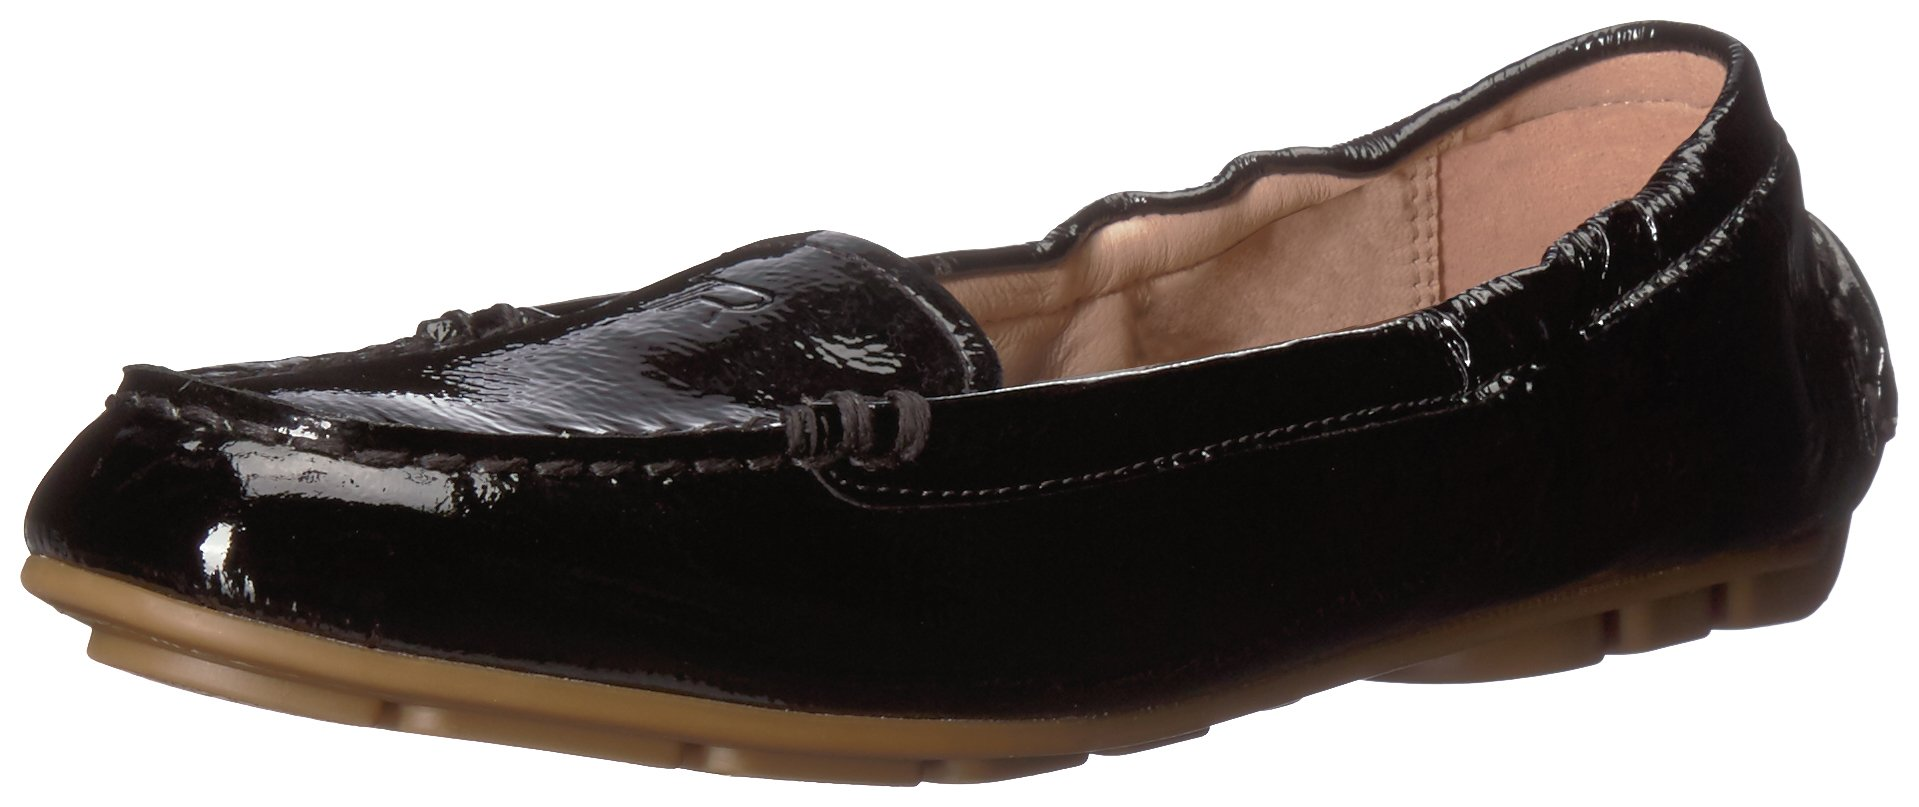 Taryn Rose Women's Kristine Crinkled Patent Driving Style Loafer, Black, 8 M M US